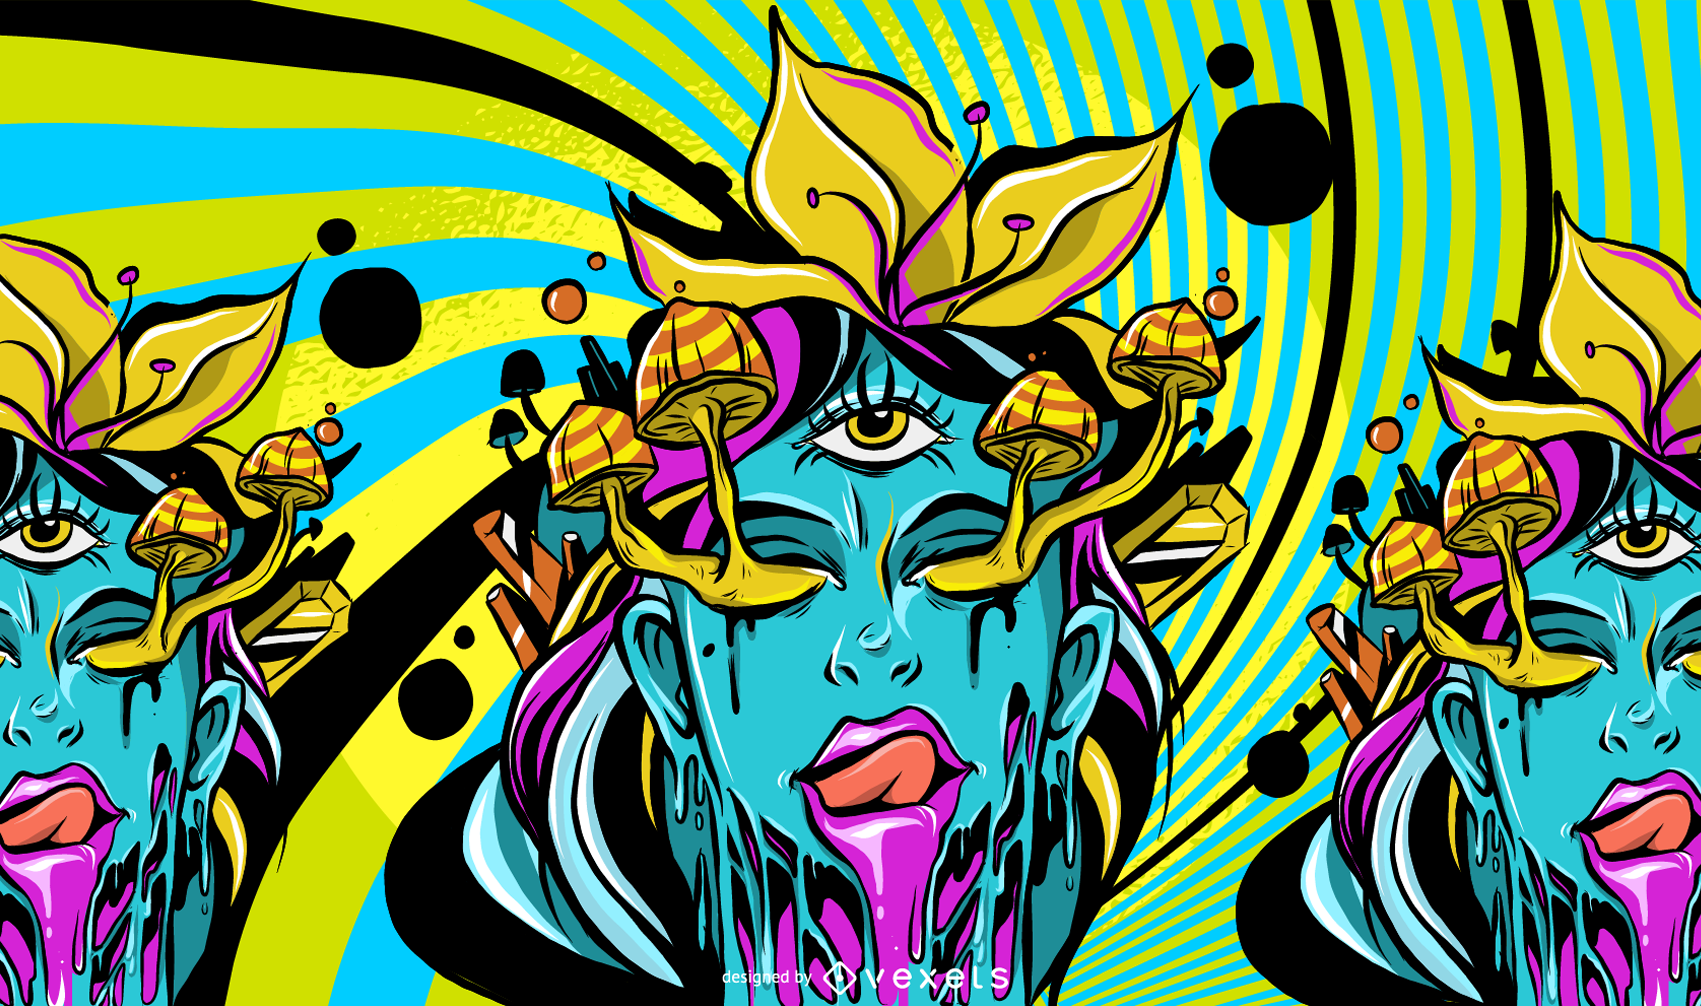 Ilustração Trippy Mushroom Girl